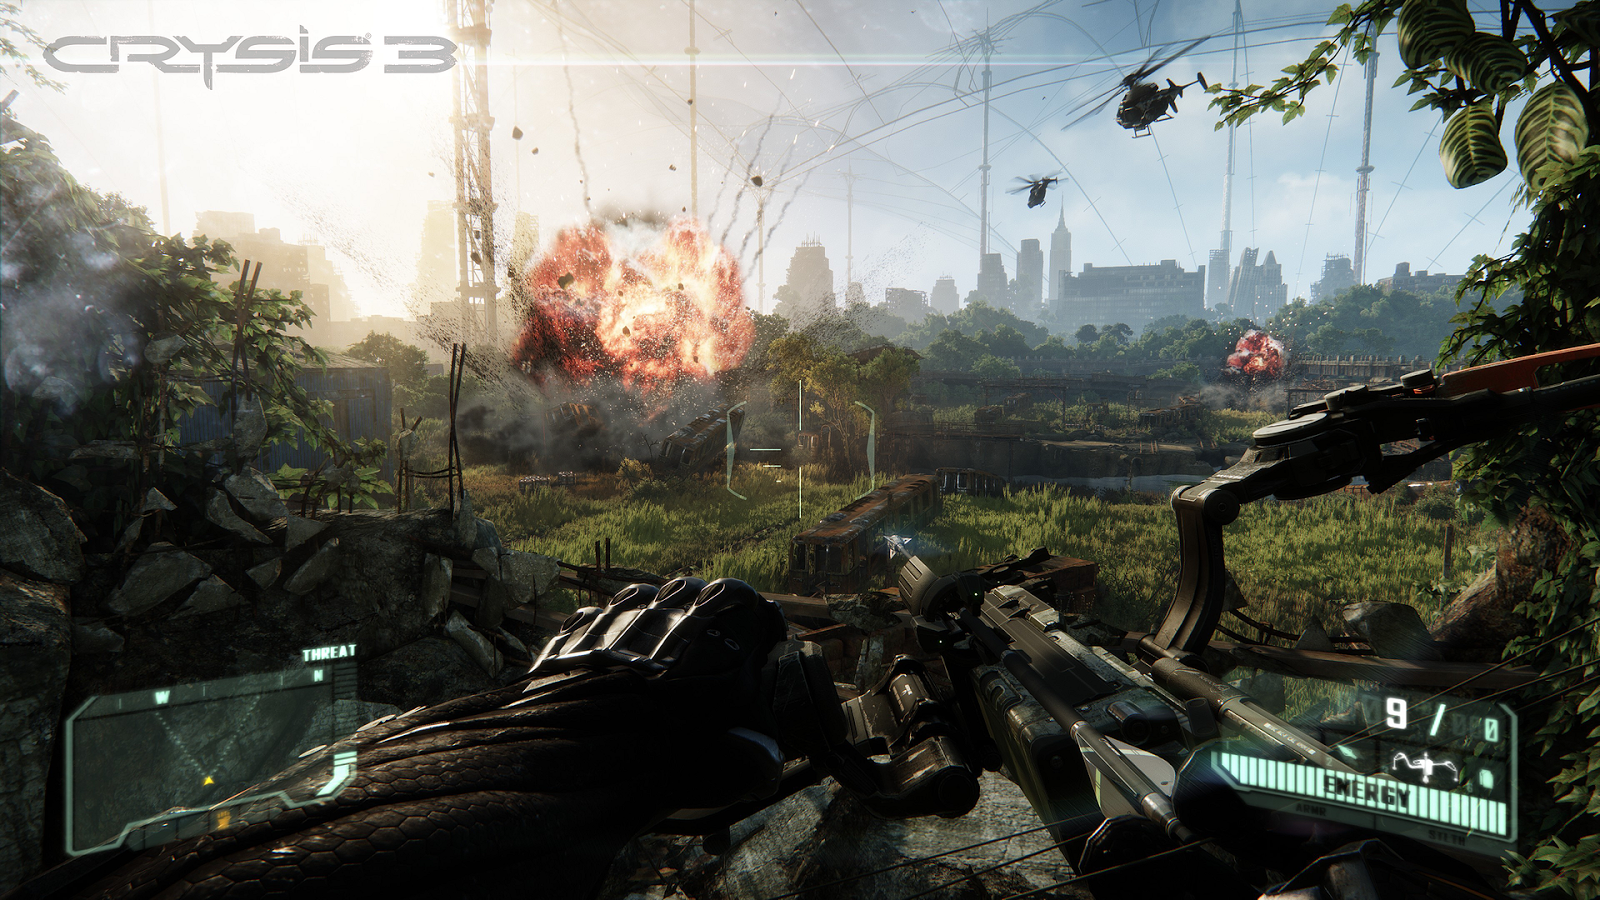 Crysis 3 Screen Shots, Wallpapers